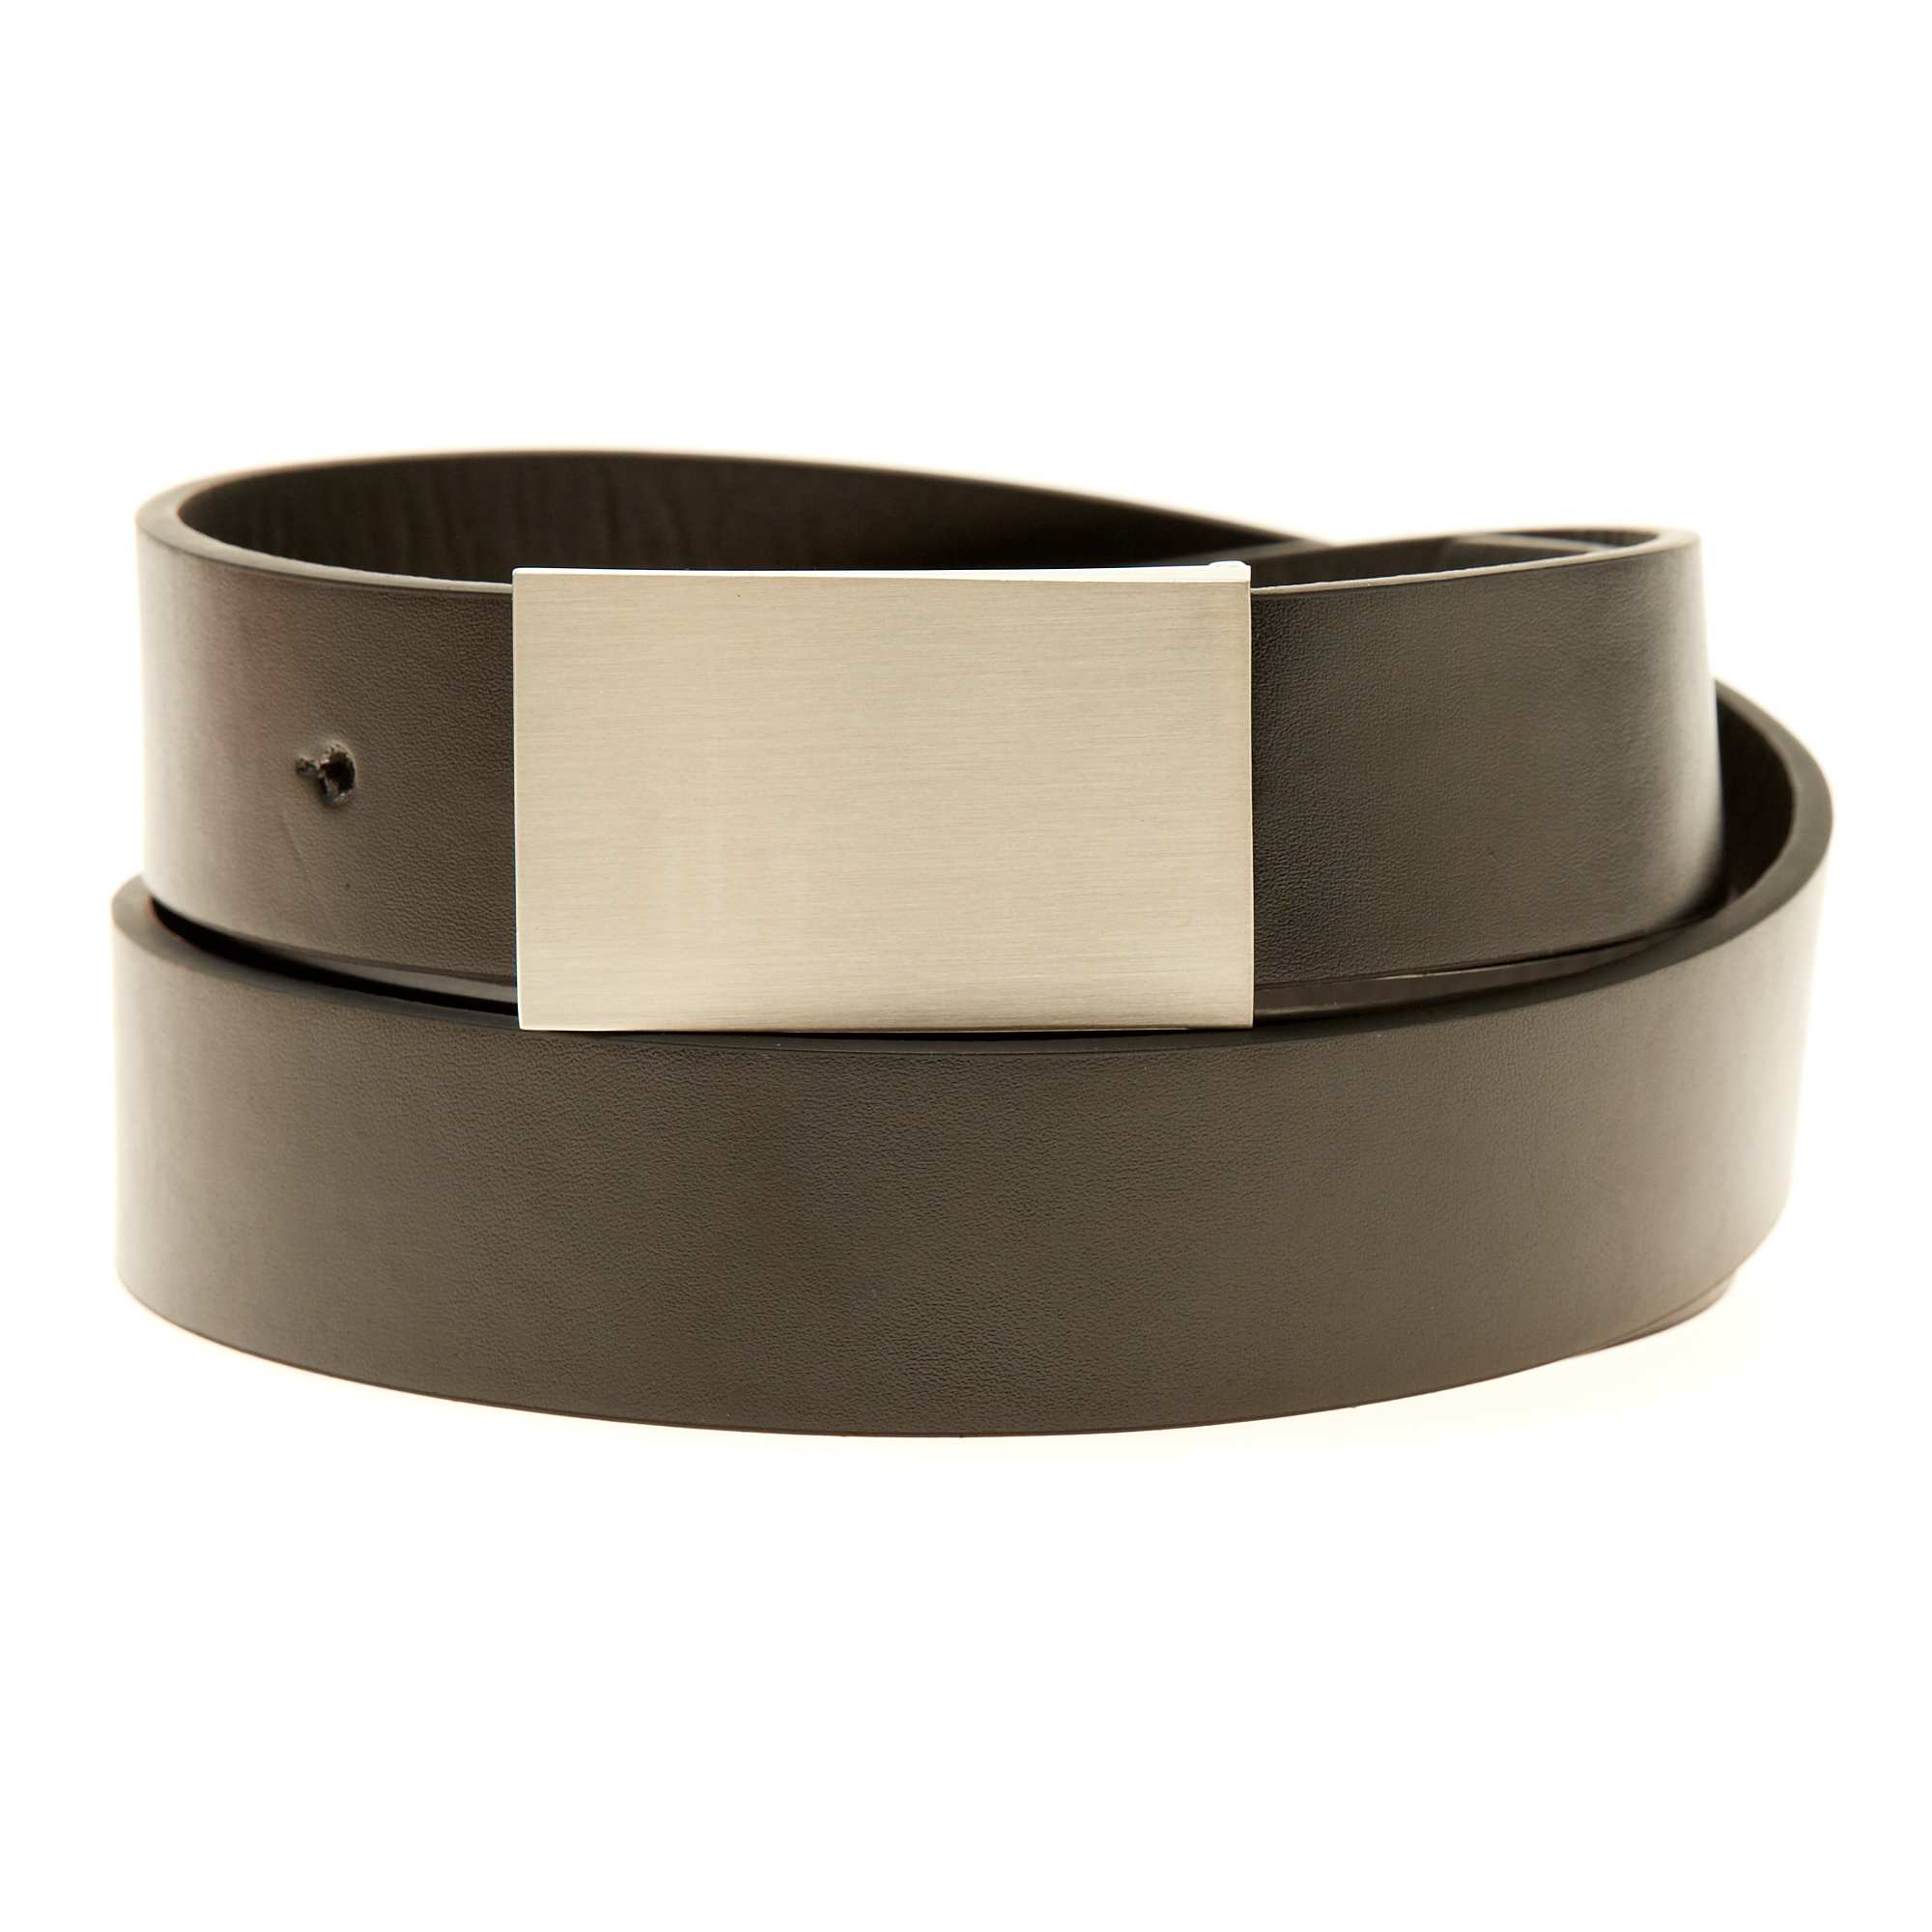 2e42e5c56 Cinturón liso de piel sintética negro Tallas grandes hombre. Loading zoom